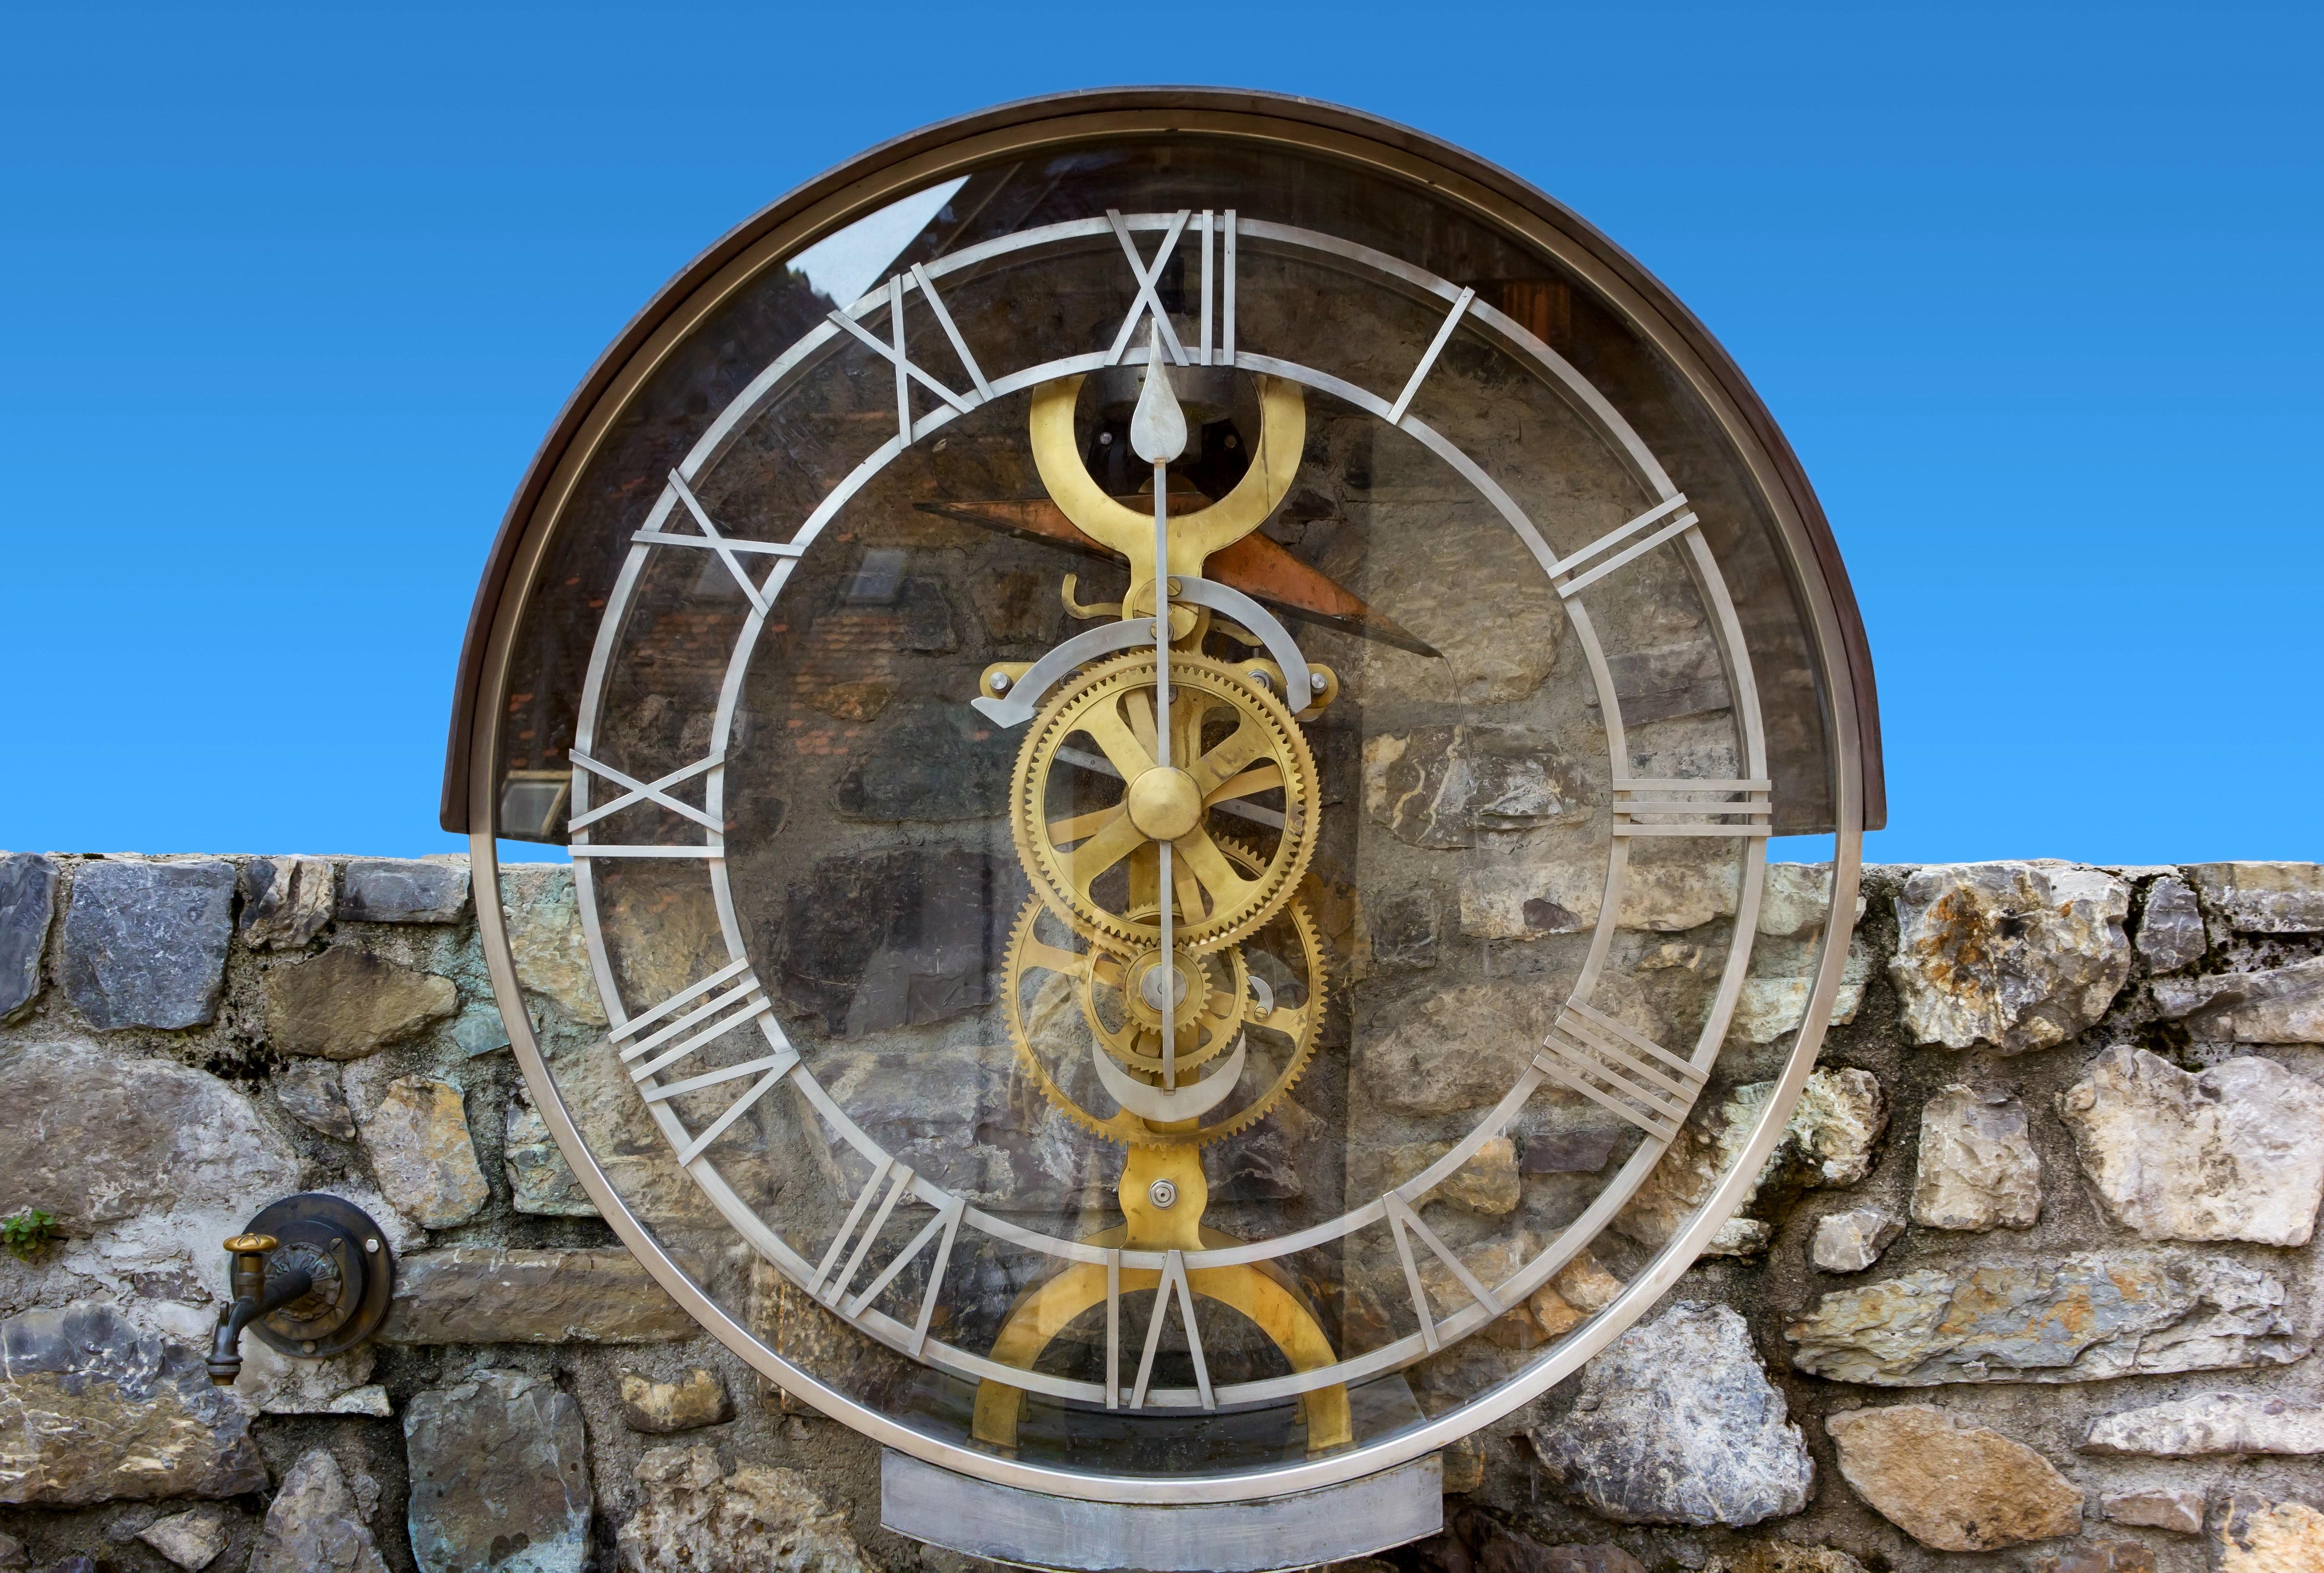 Pesariis, the clock village